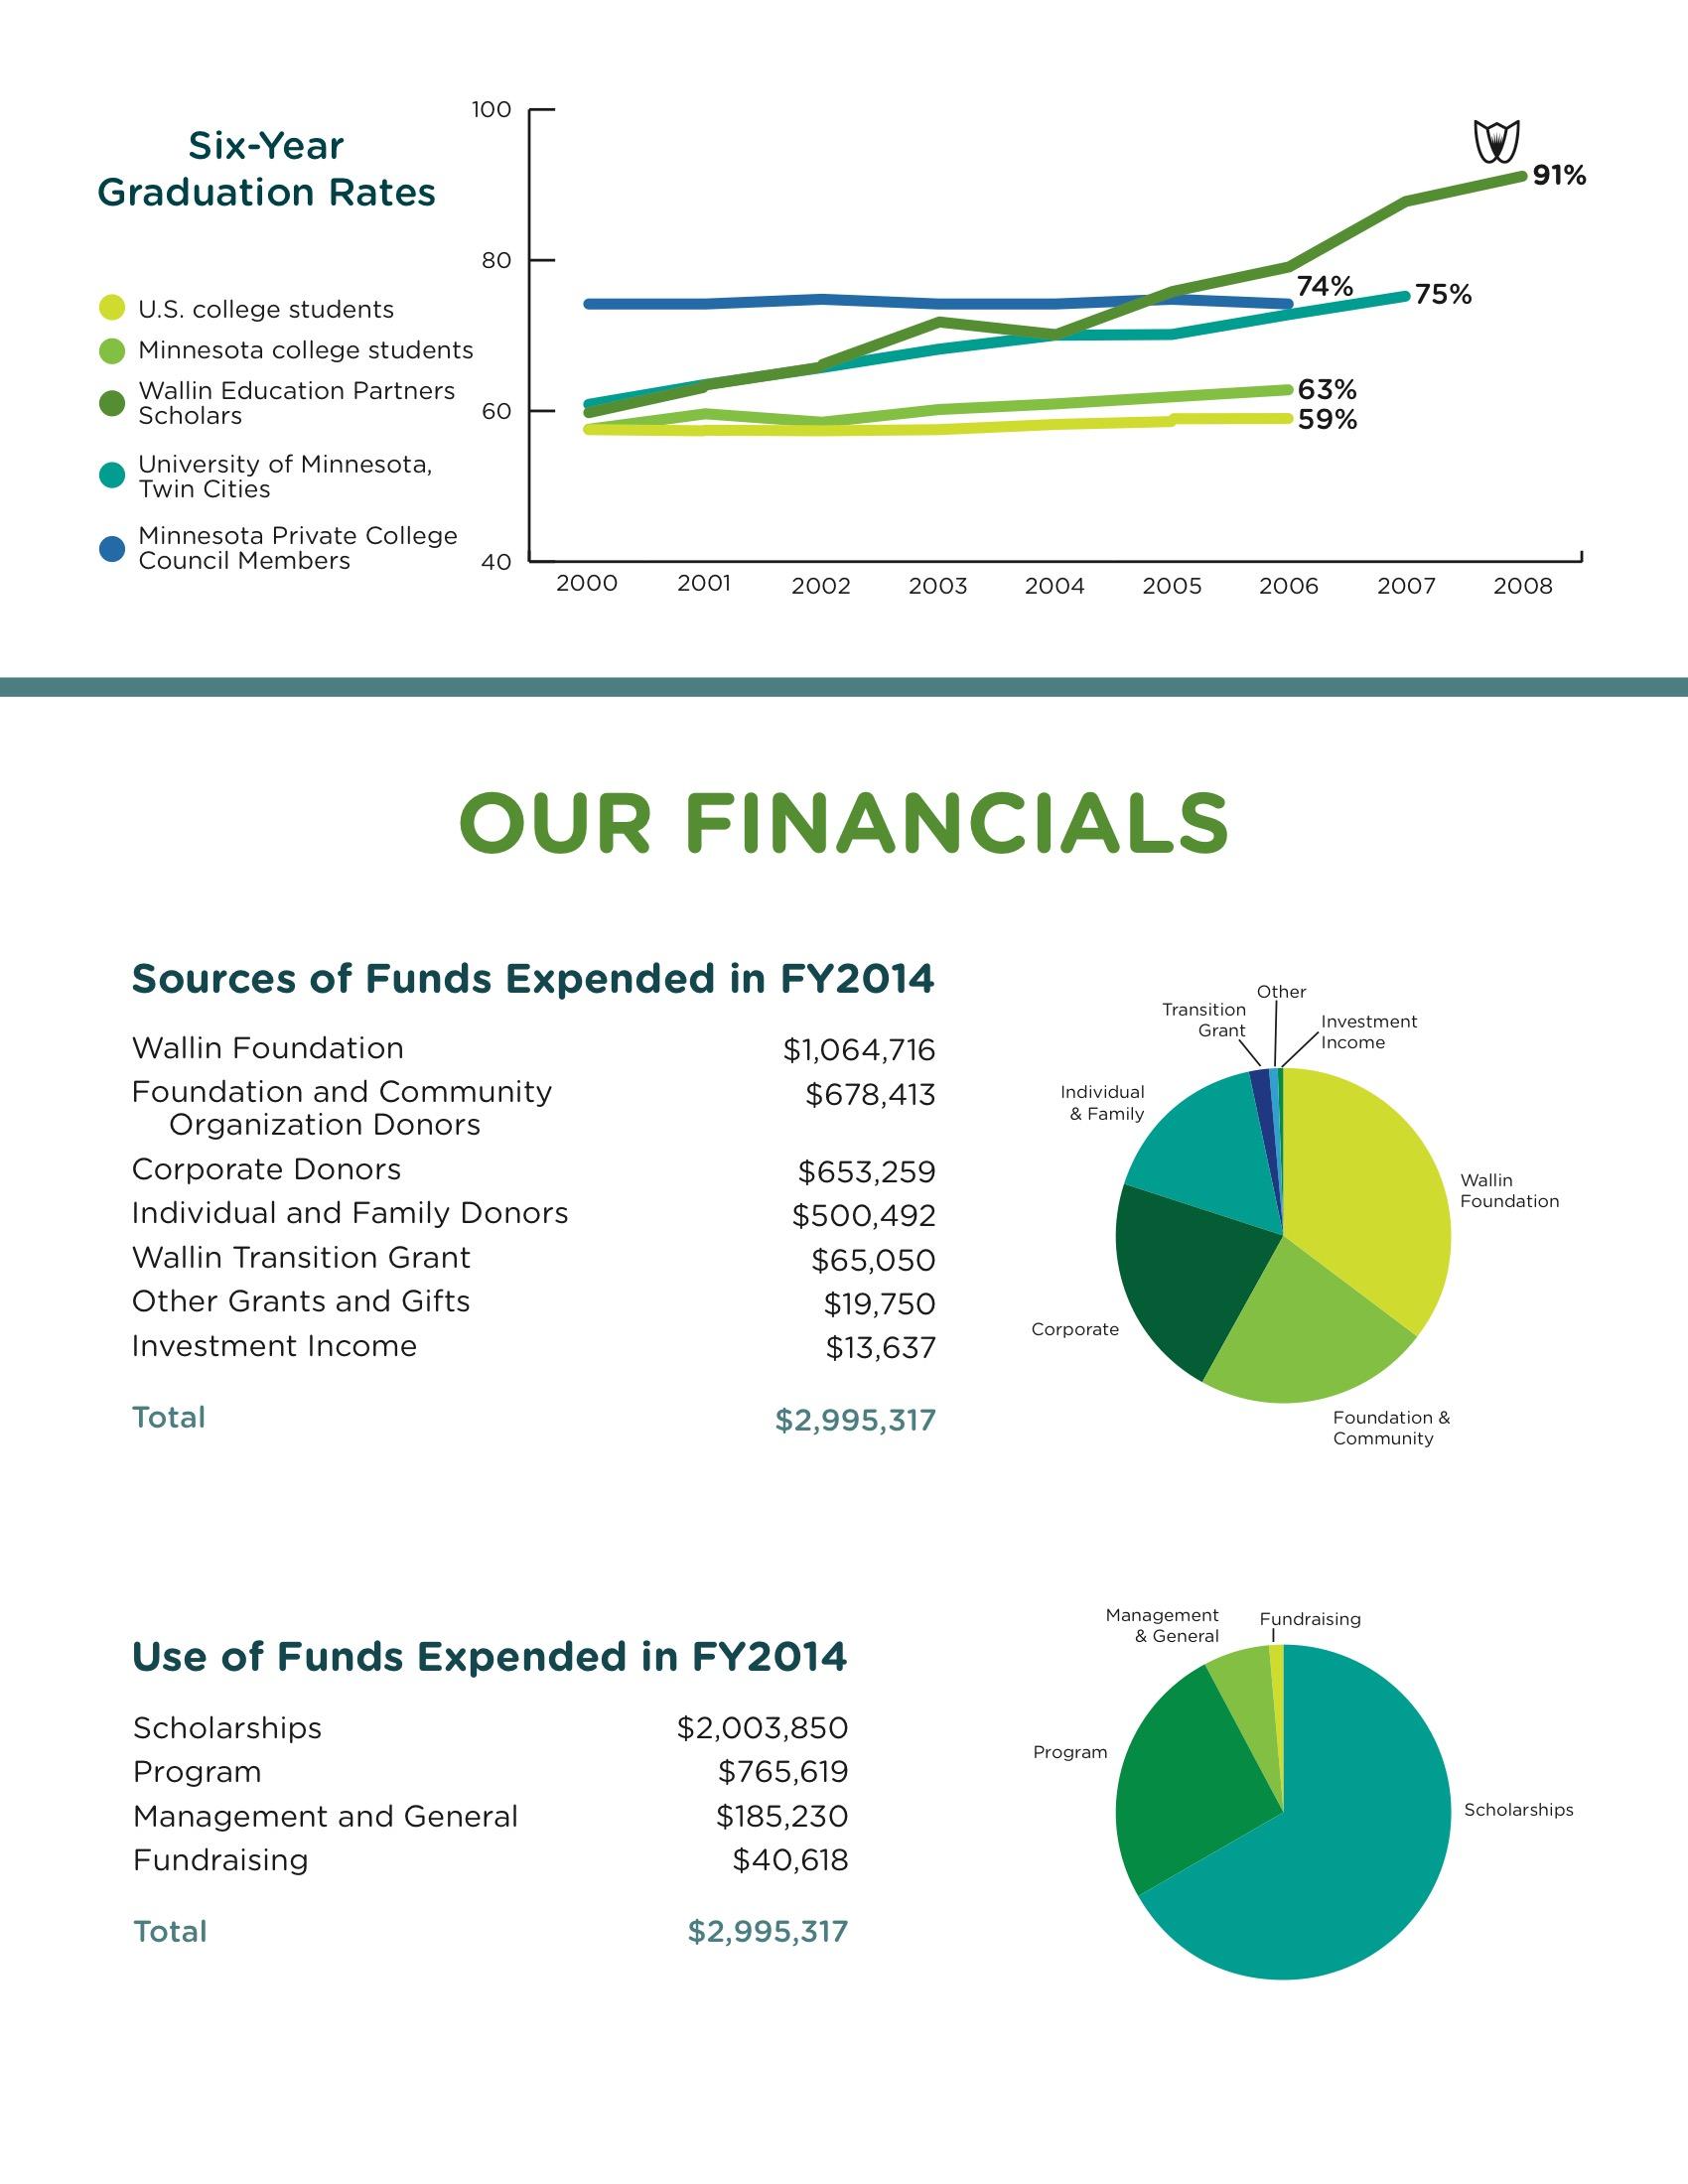 FINANCIALS / ANNUAL REPORT